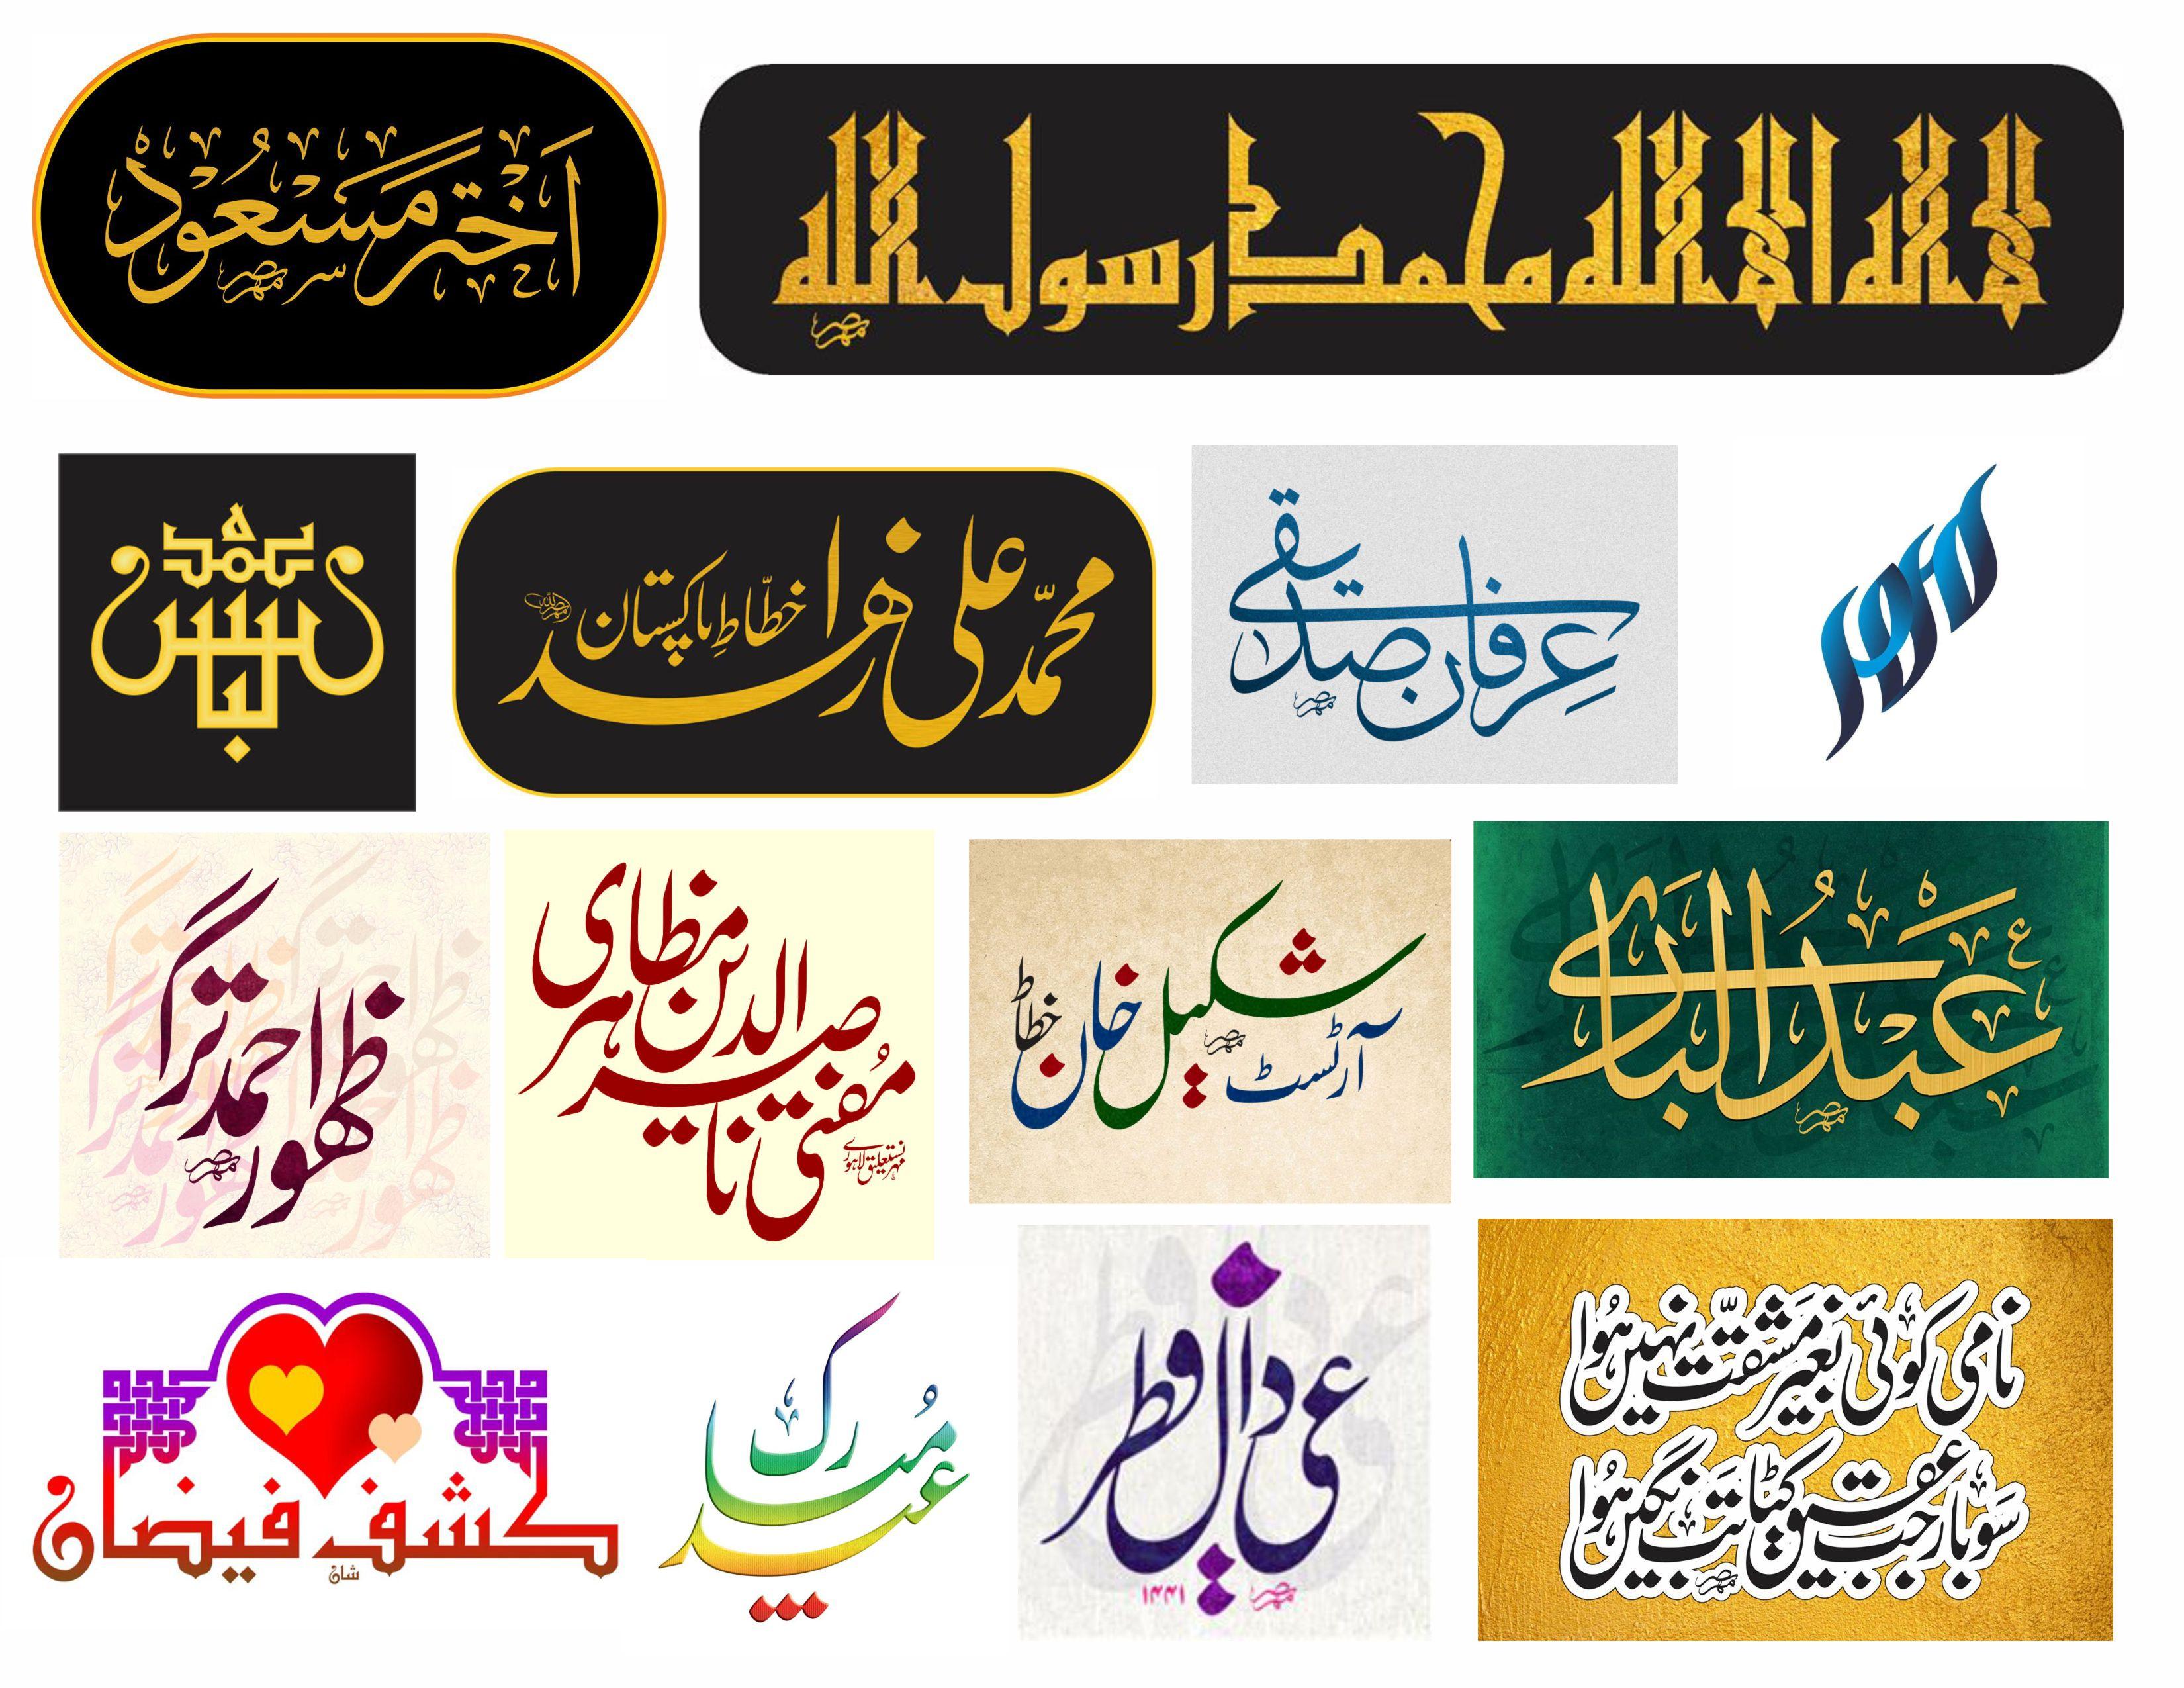 Professional Persian Urdu Arabic calligraphy and logo design services